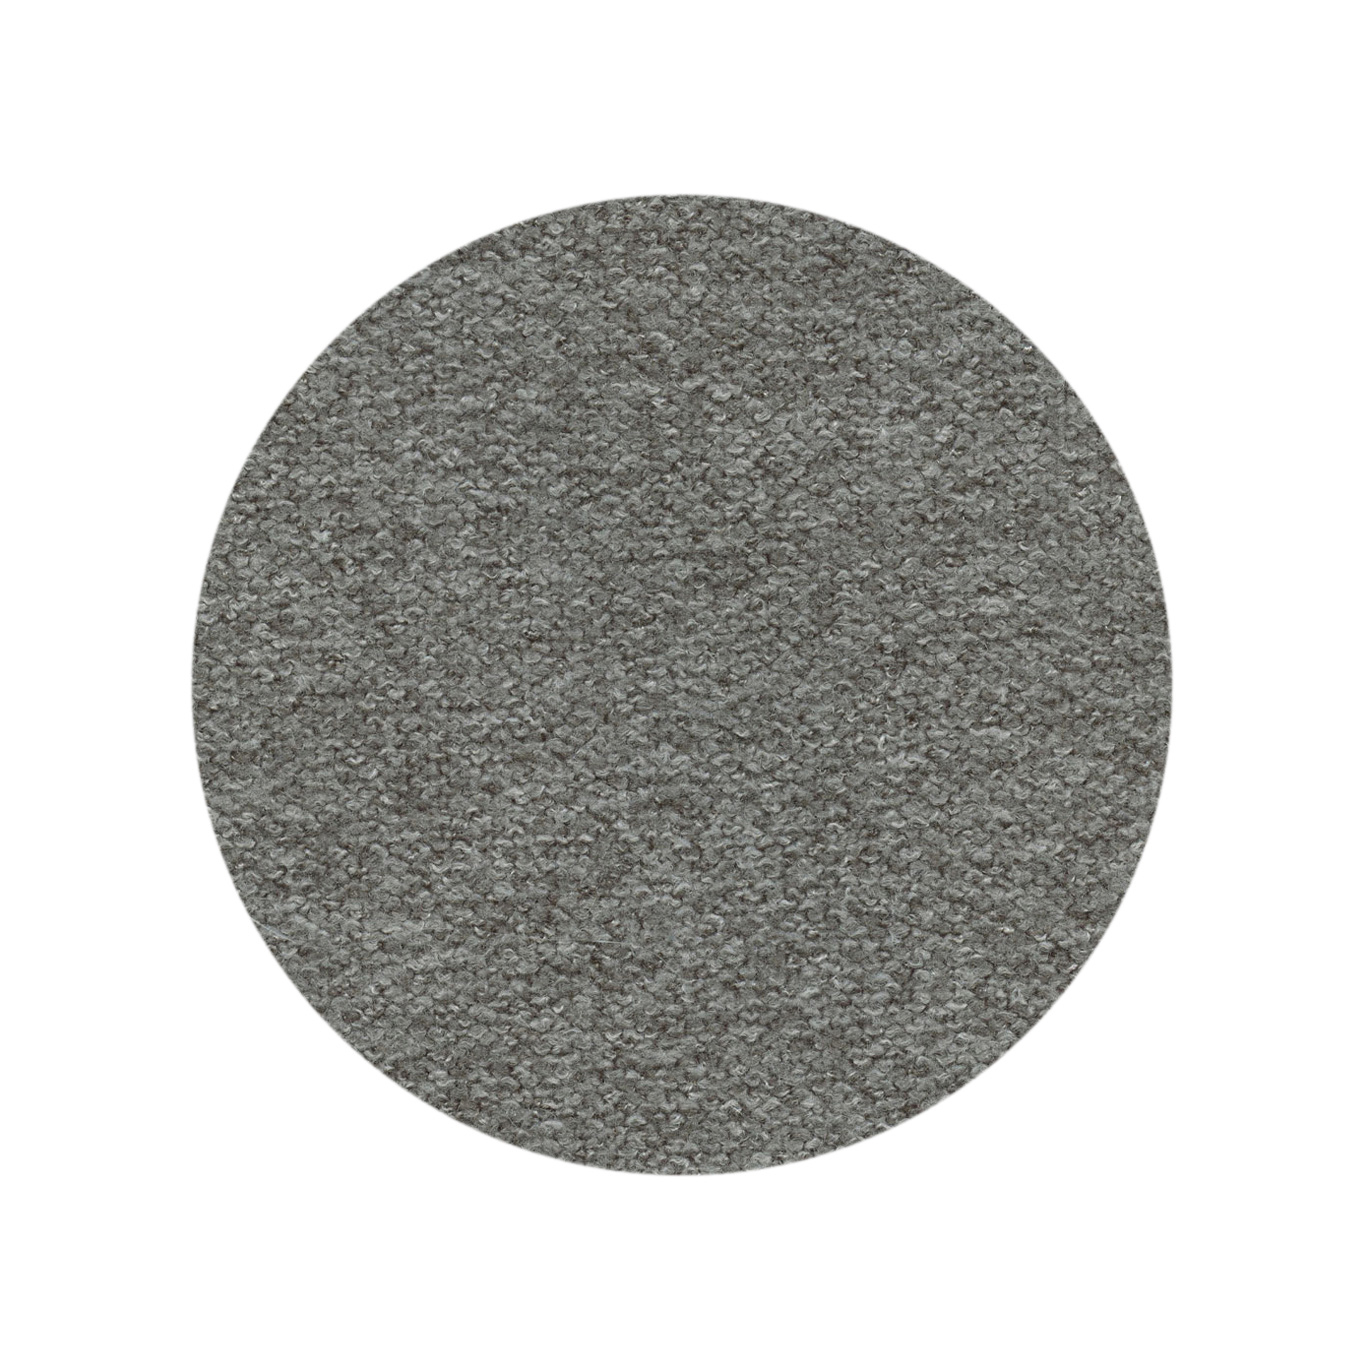 Marled Microfiber - Heather Gray